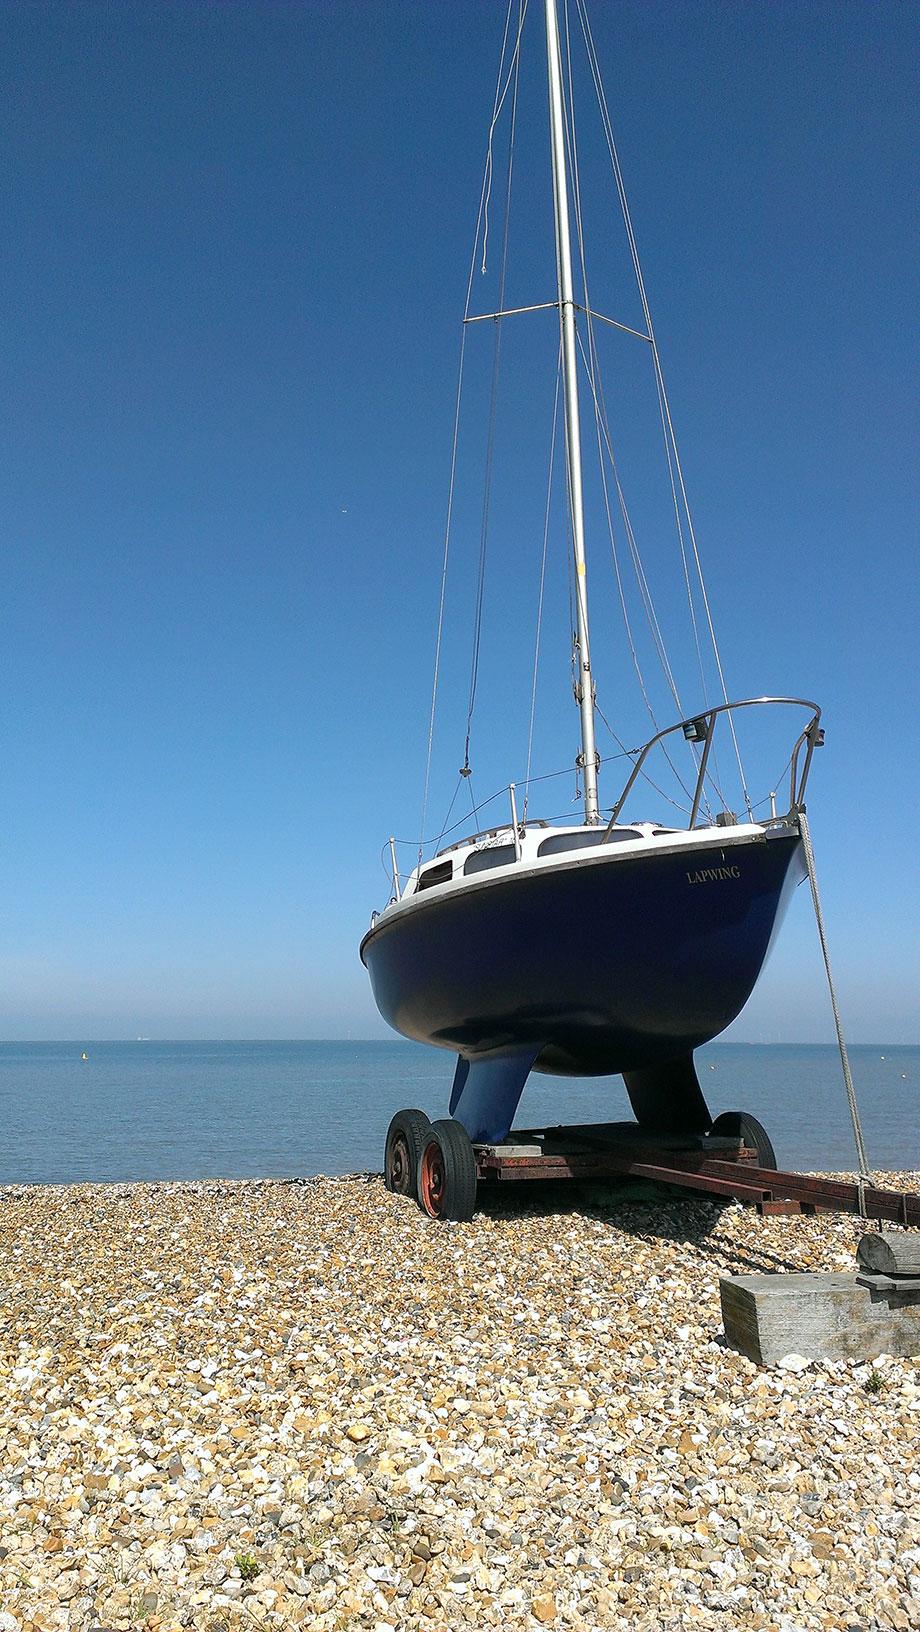 ICMSTUDIOS - Lovely blue sky, Beautiful boat. Very peaceful :)